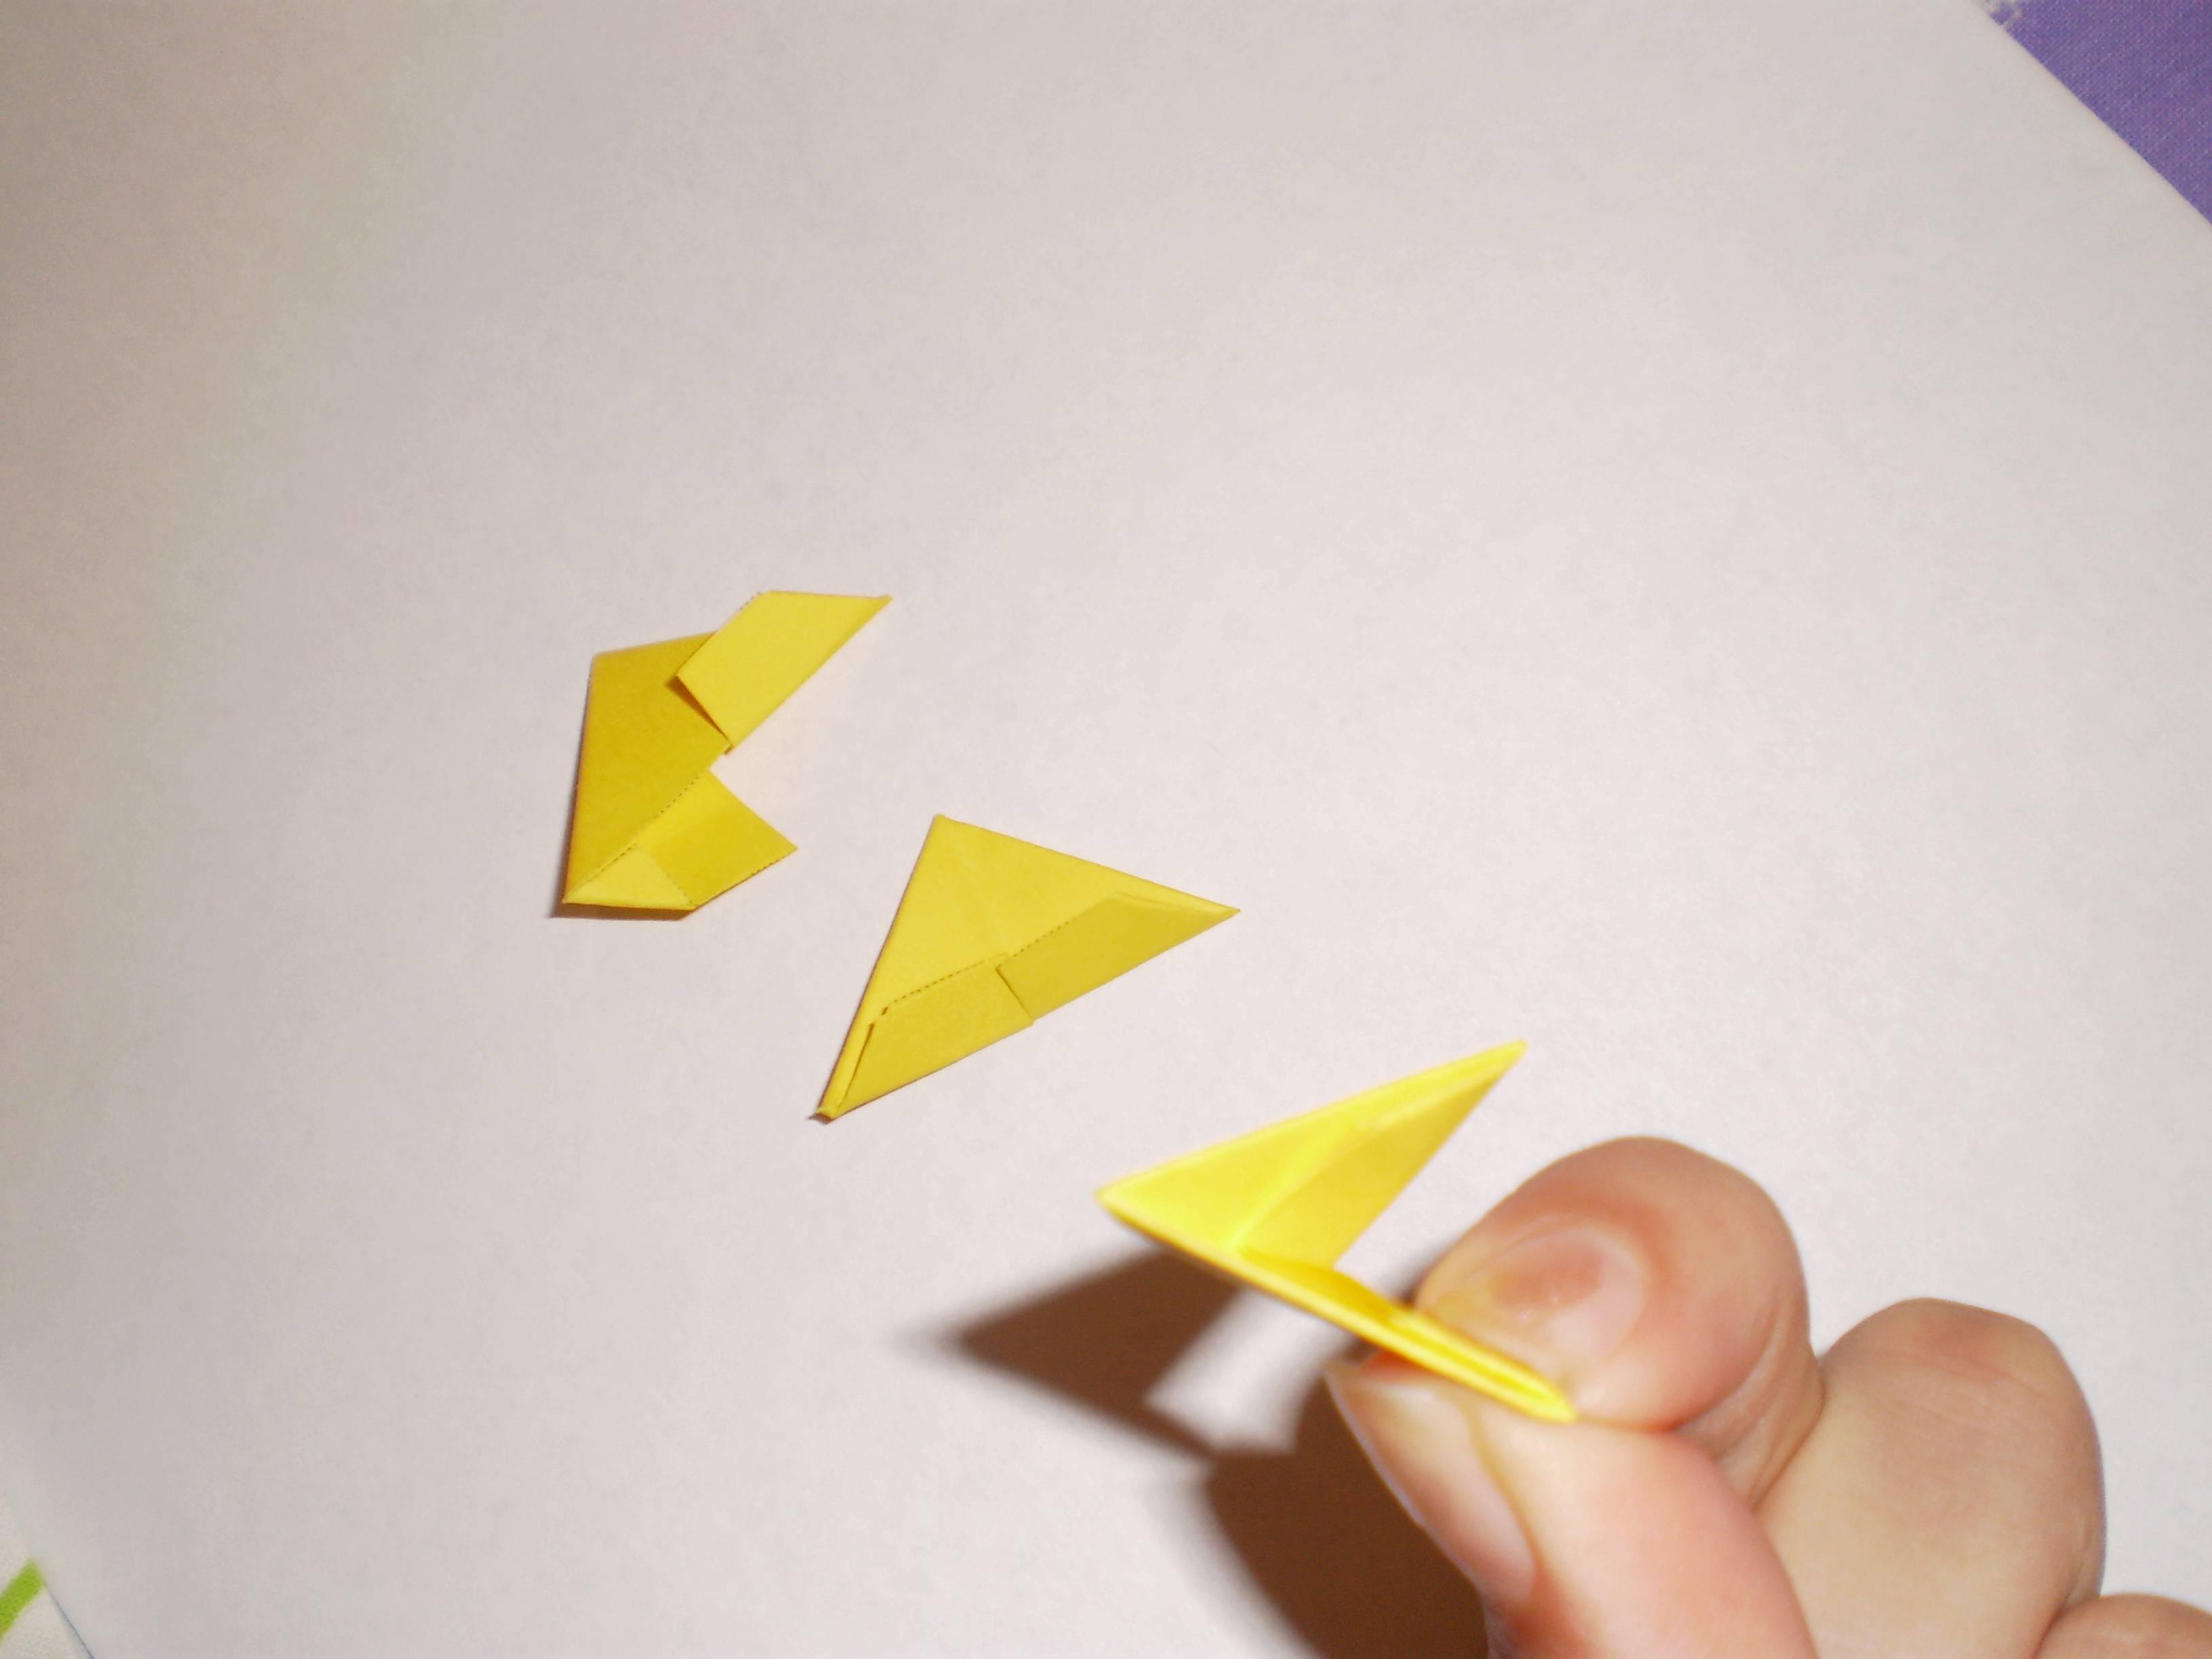 Набор участников на сборку Змеи - символ 2013. Модульное оригами! - Страница 5 C22bc1374107ff247aae8107803ff1db